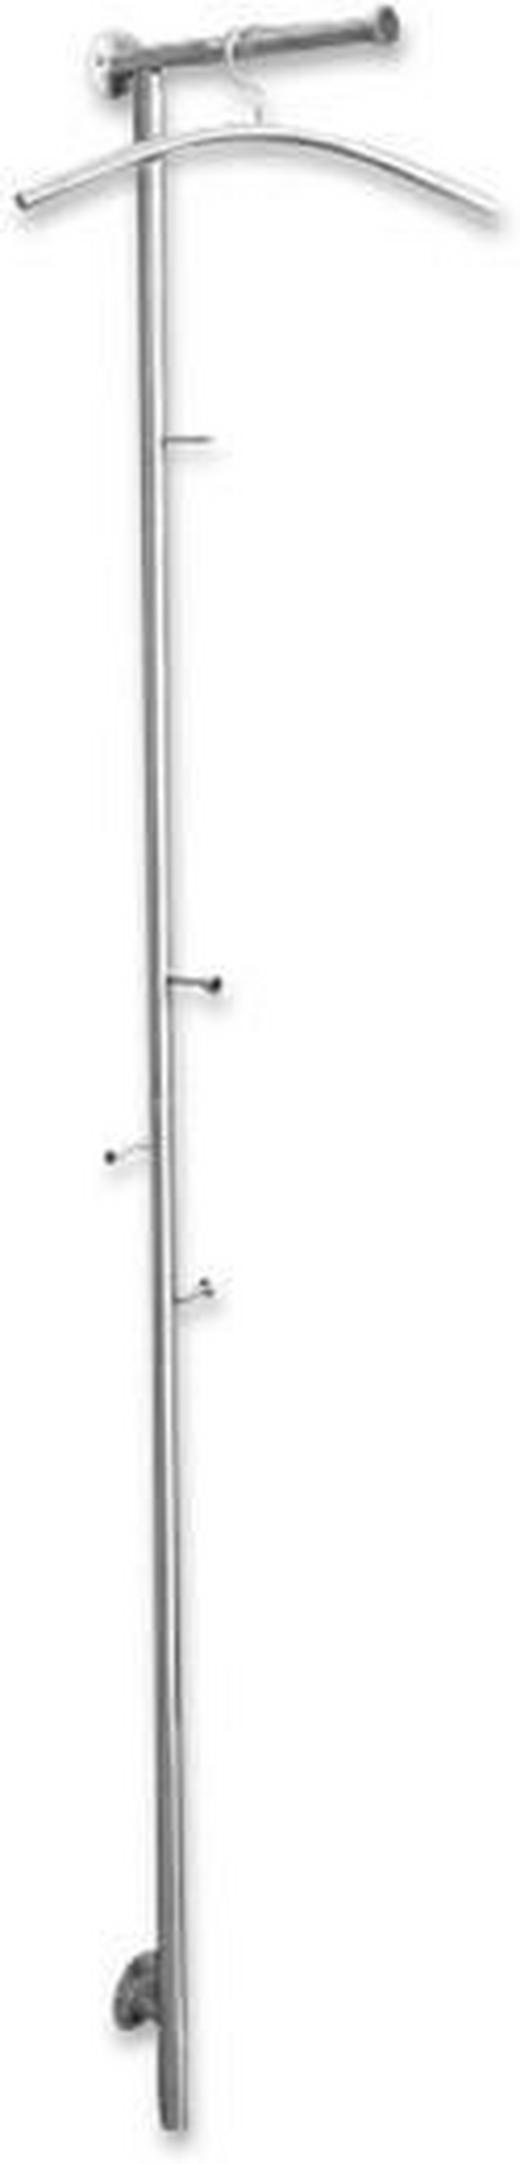 WANDGARDEROBE Edelstahlfarben - Edelstahlfarben, Design, Metall (8.5/193/32cm) - CARRYHOME